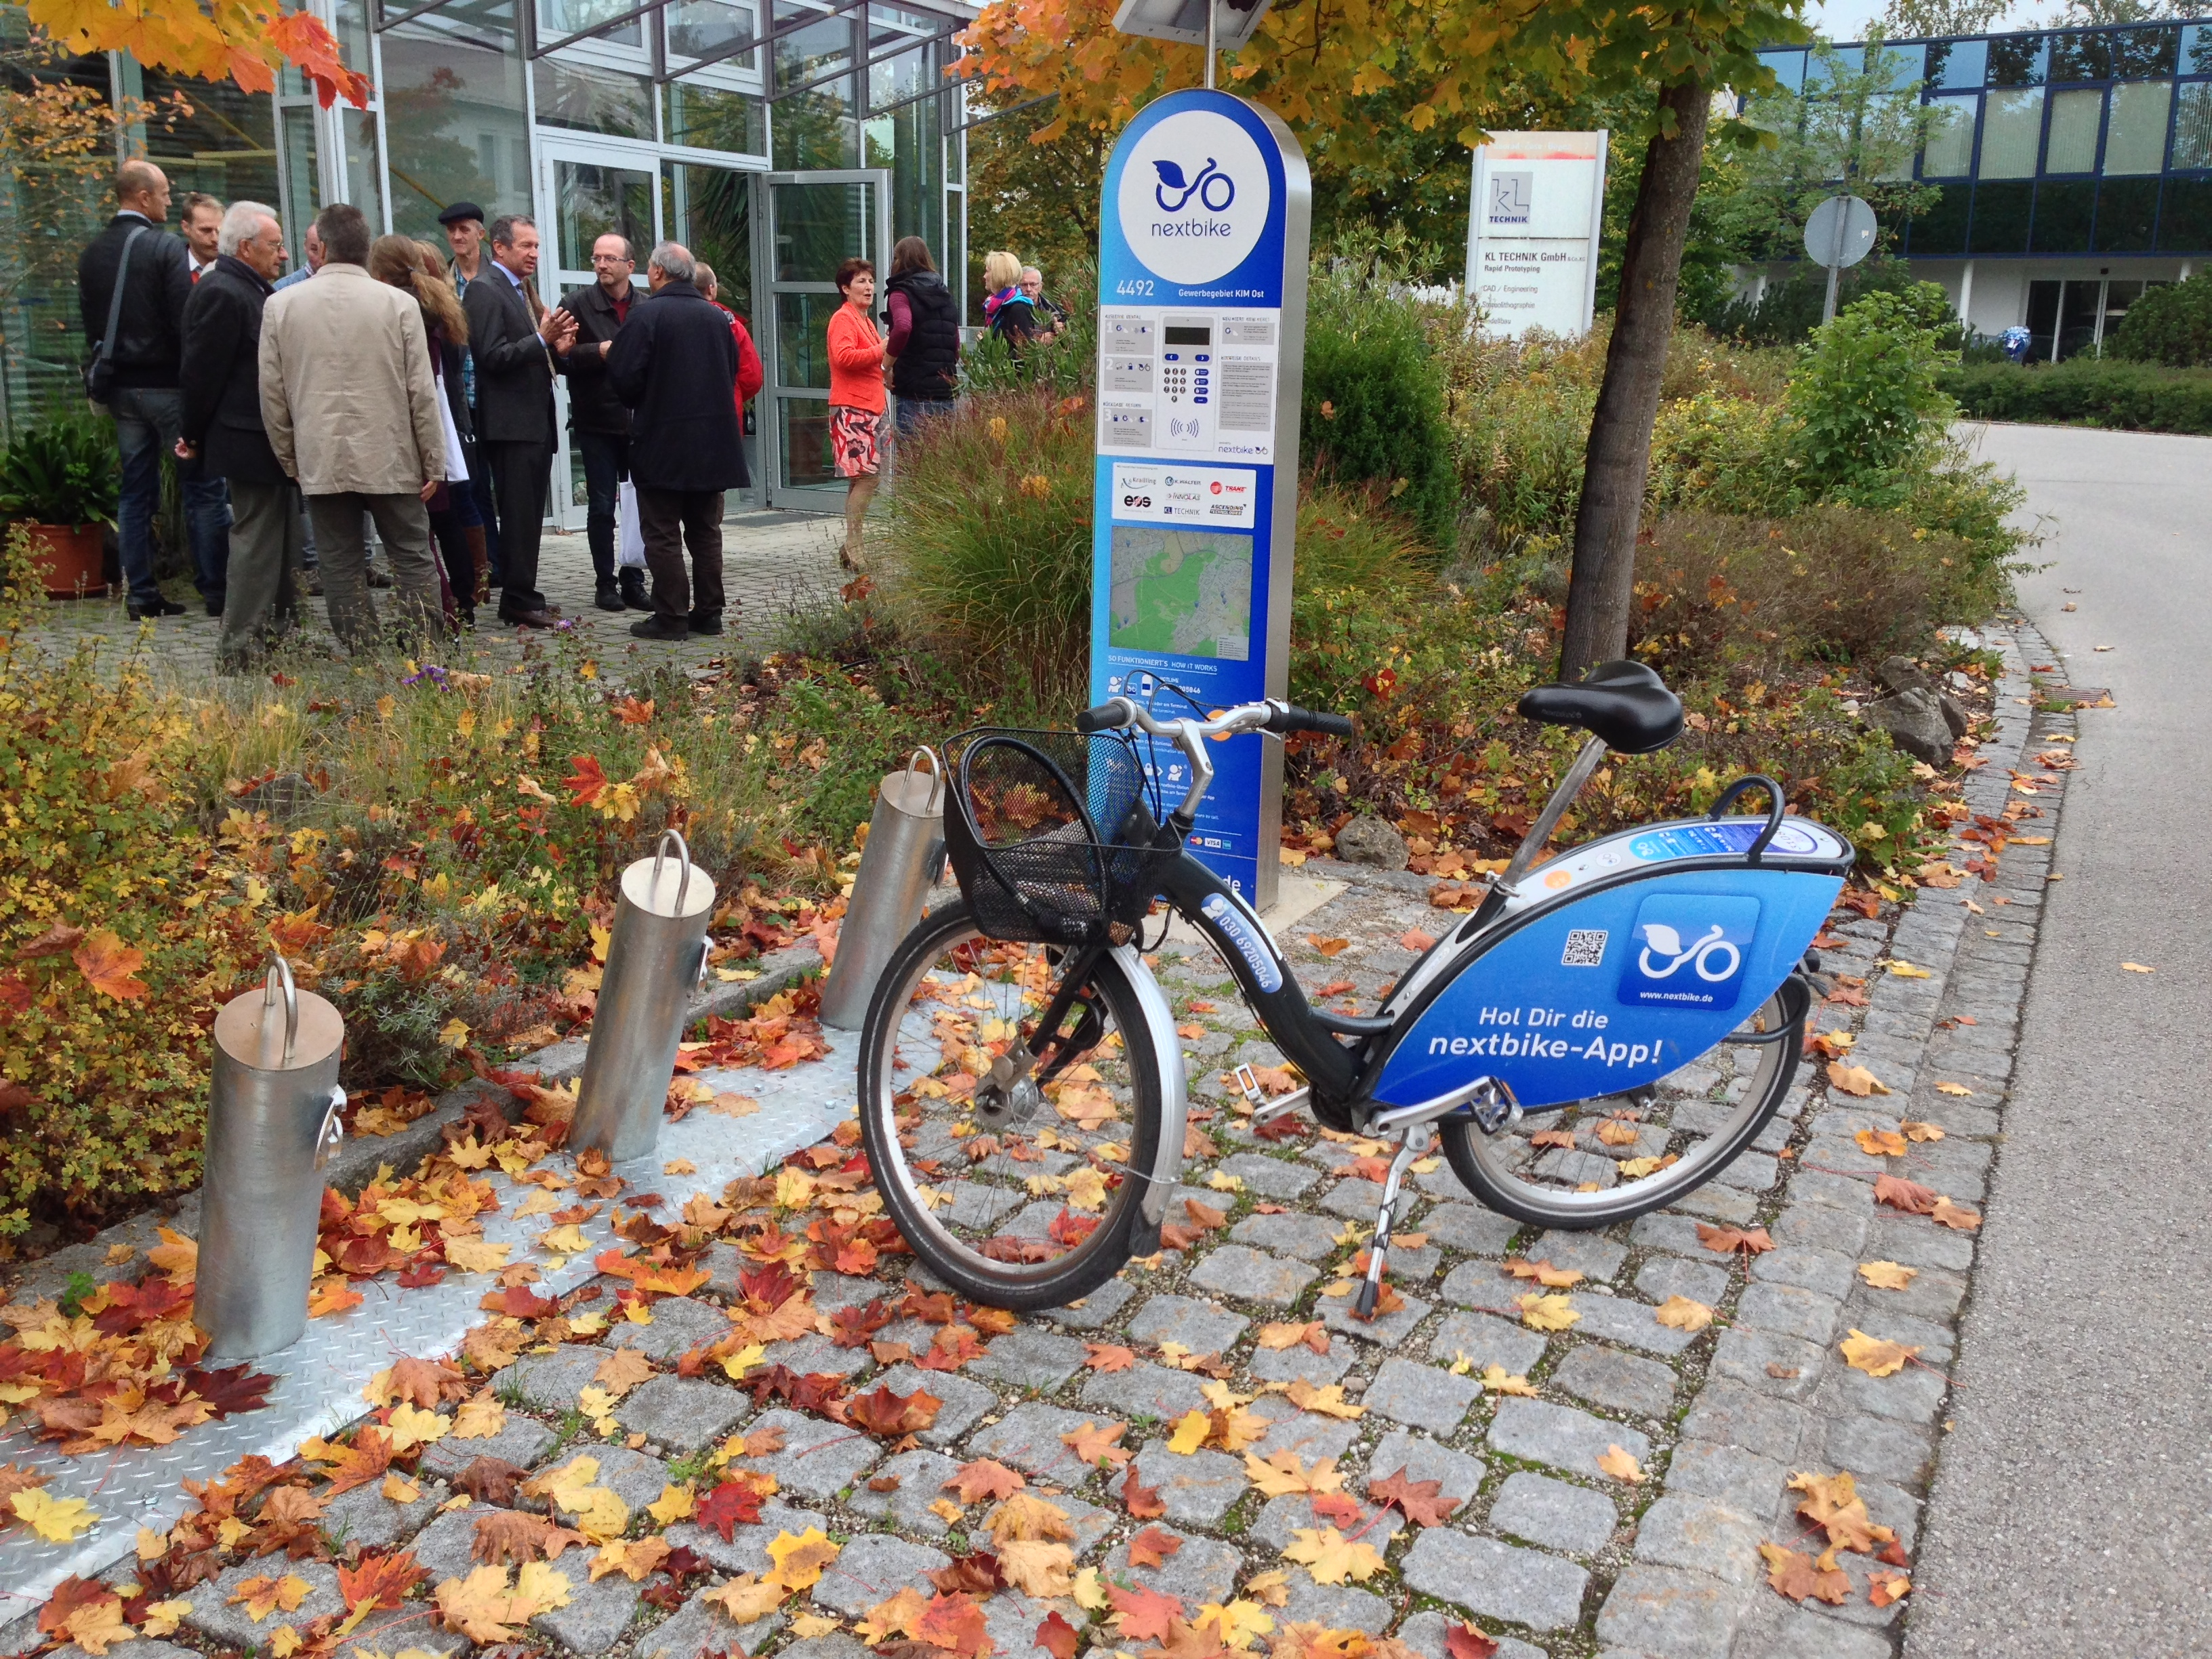 Krailling Innovation Park Nextbike station